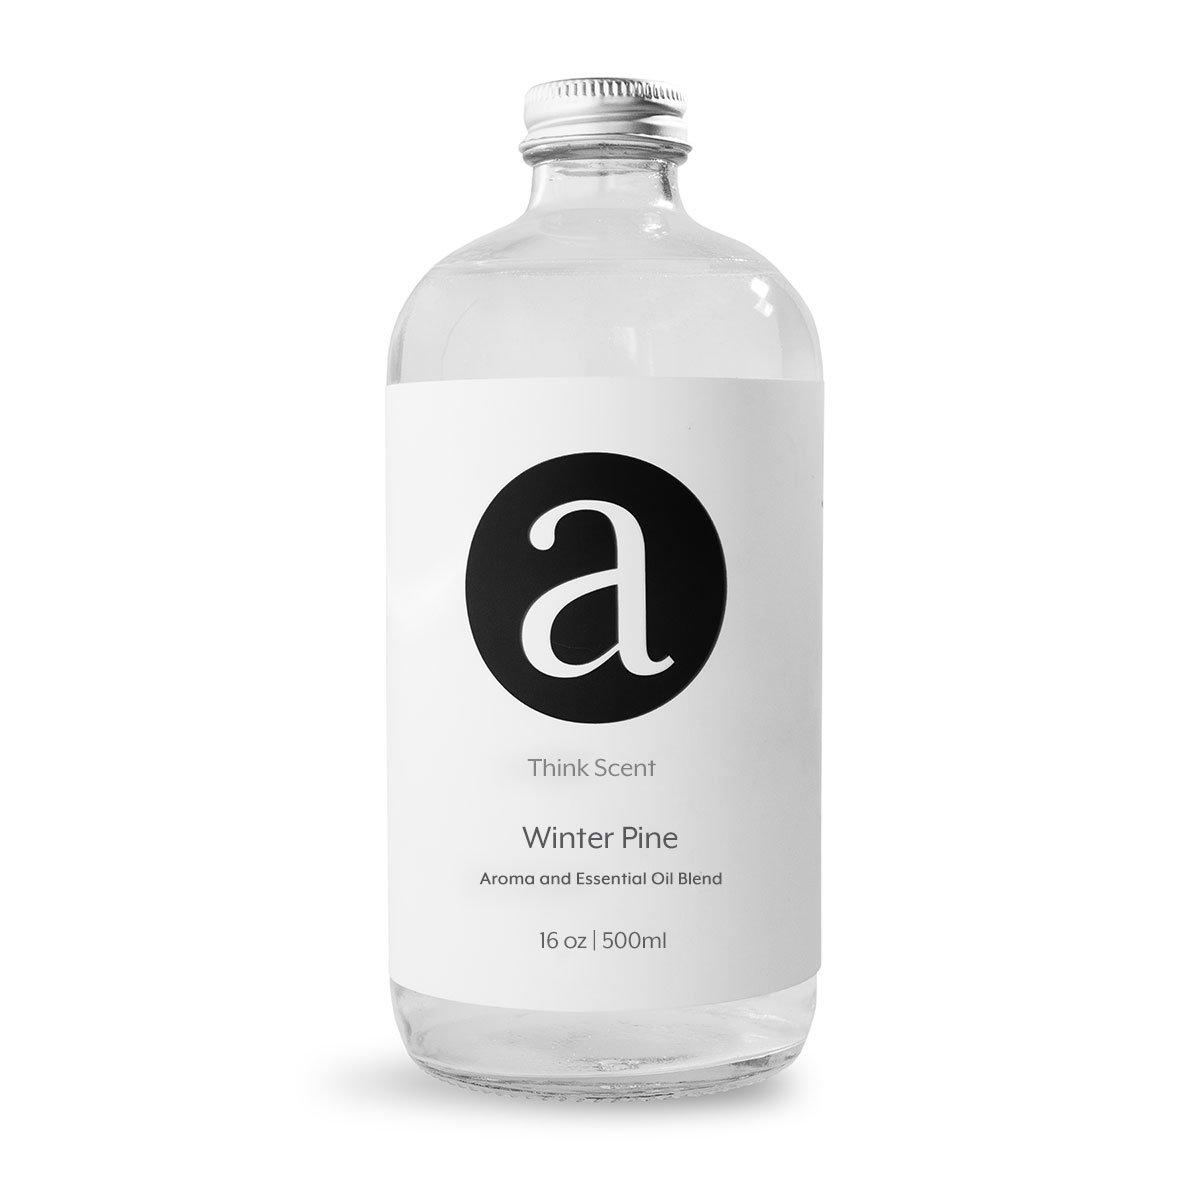 (Winter Pine) Aroma / Fragrance Oil For AromaTech Air Freshener Scent Diffuser (Half Gallon)